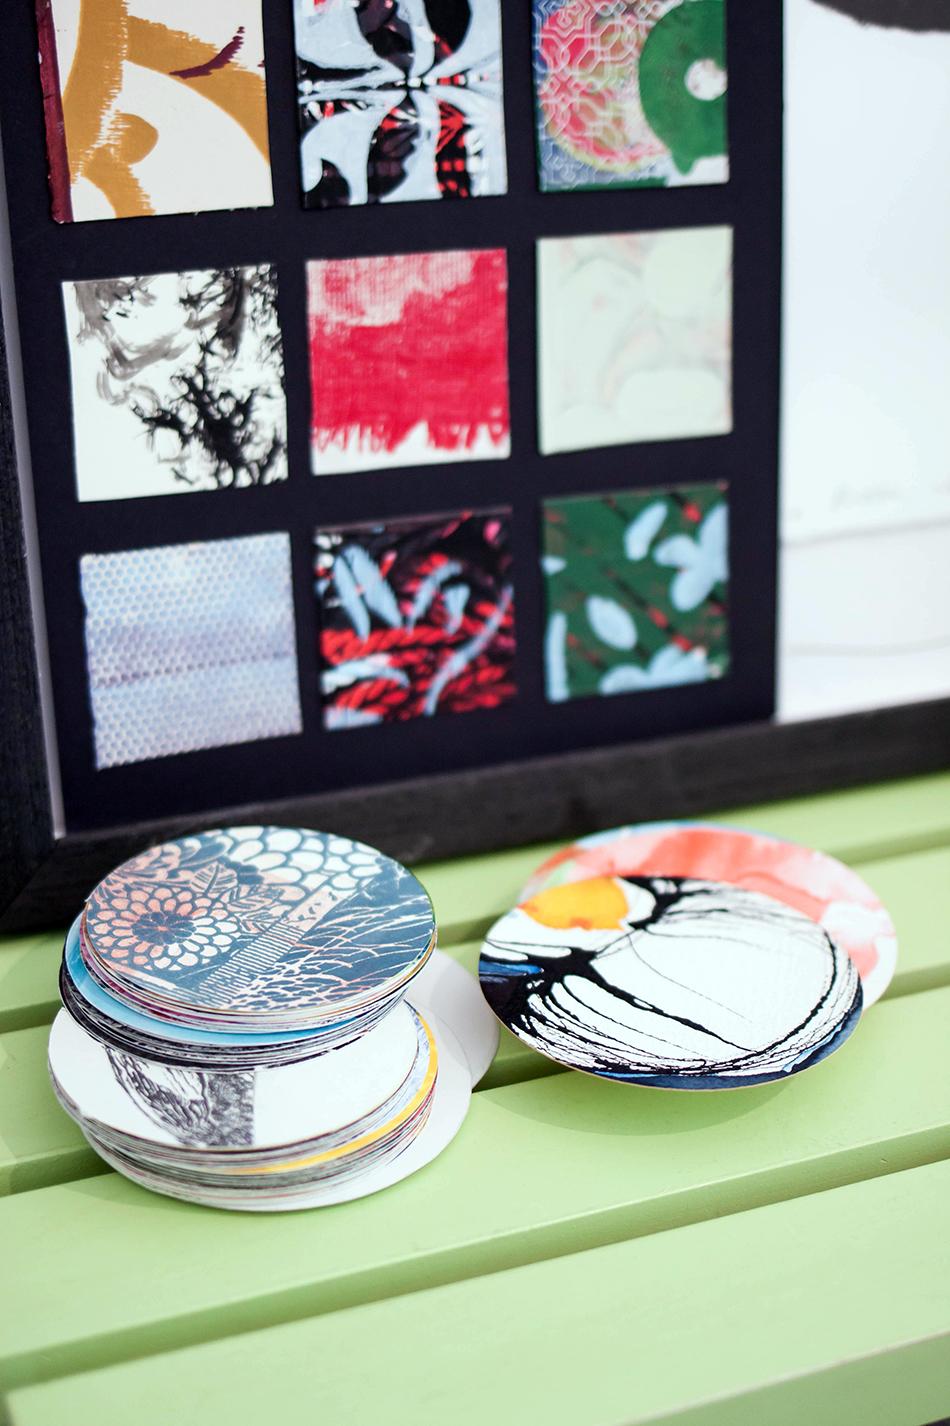 The Corner Store Gallery, Studio Visit with Sarah Montgomery